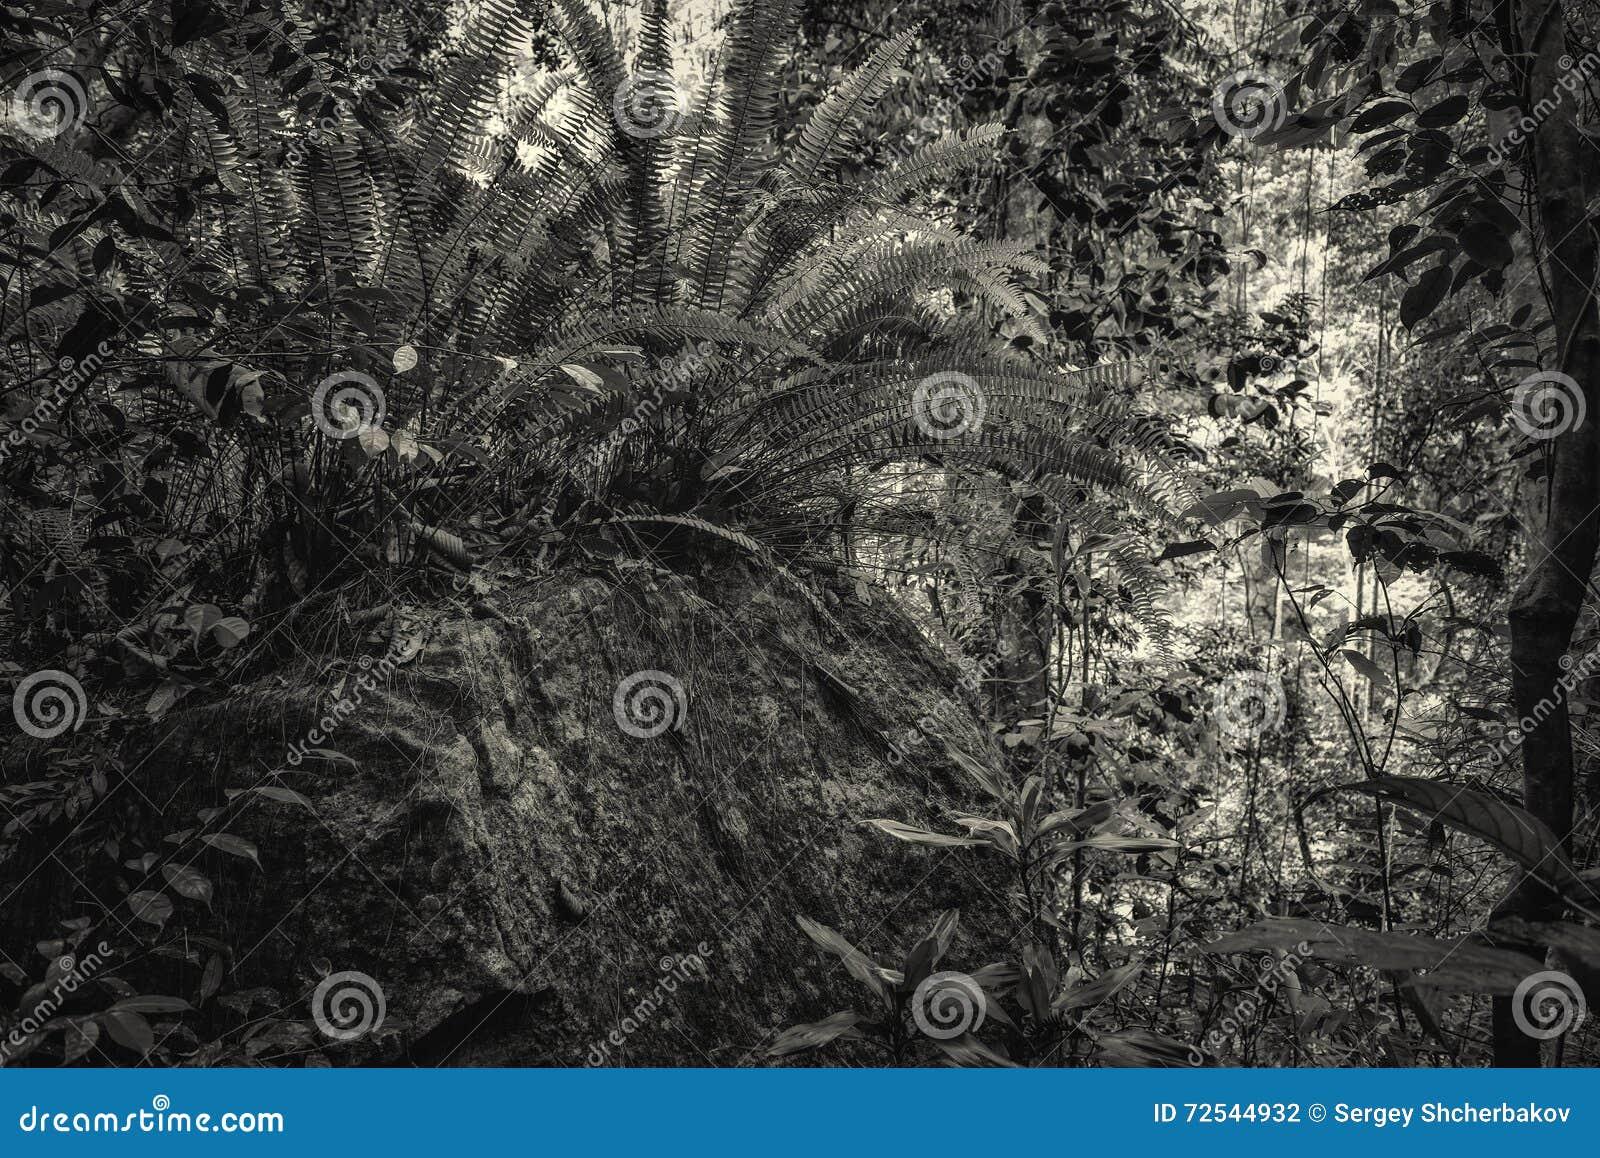 Jungle in black and white